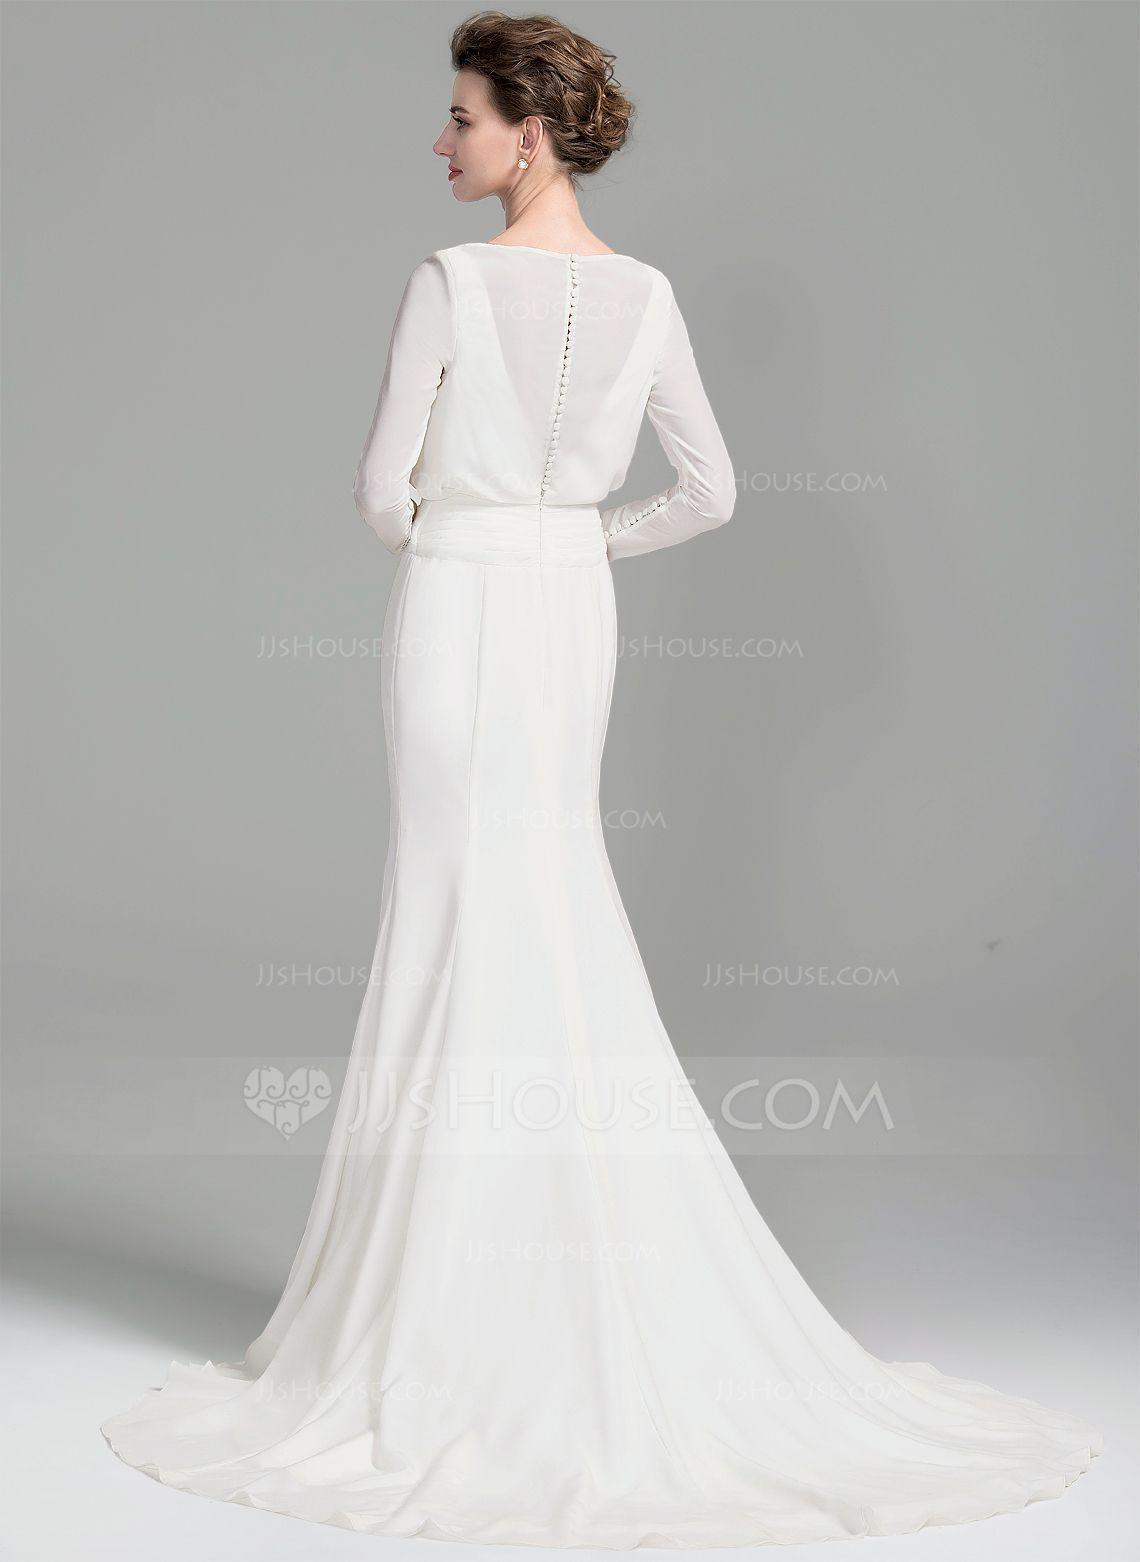 Sheathcolumn scoop neck court train chiffon wedding dress with